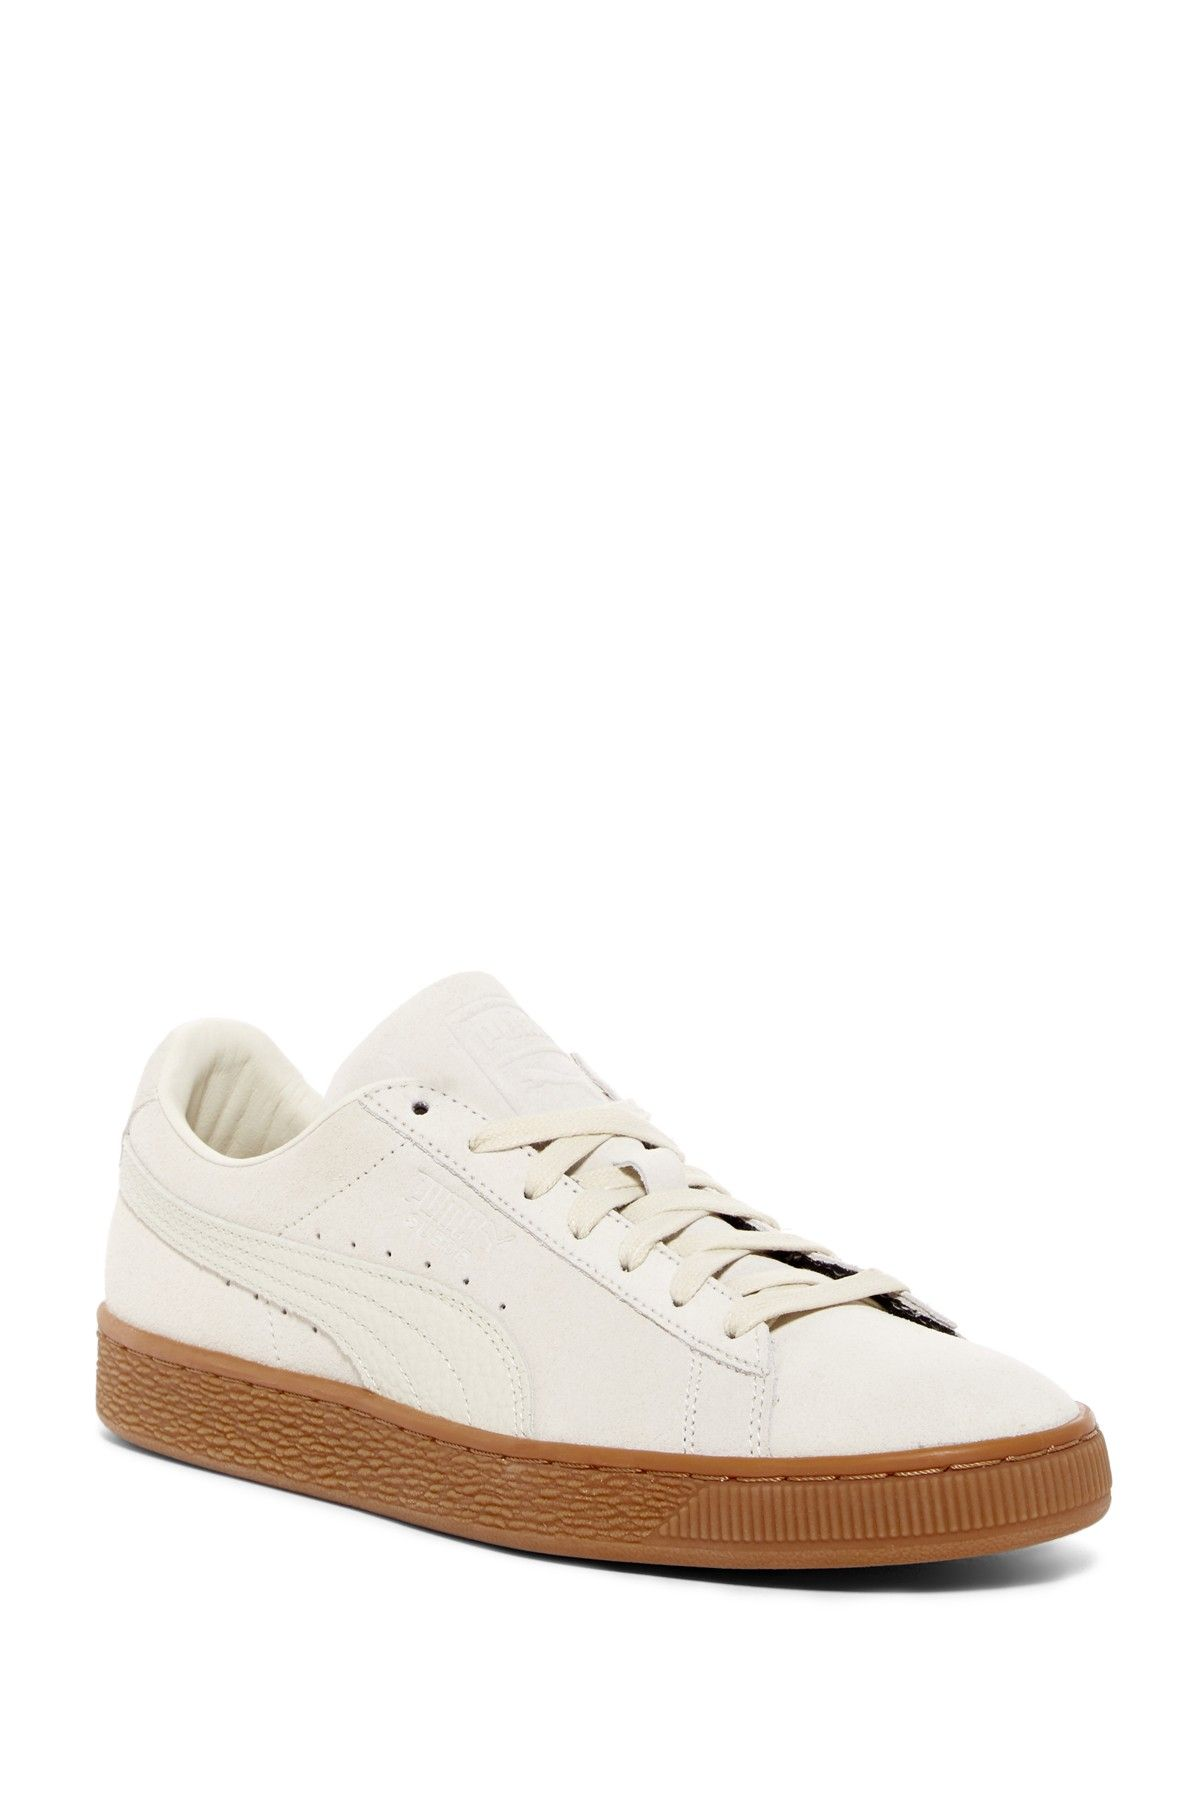 La Chaussure Puma Clyde Schoenen Naturel Ee q1hjGAS6R